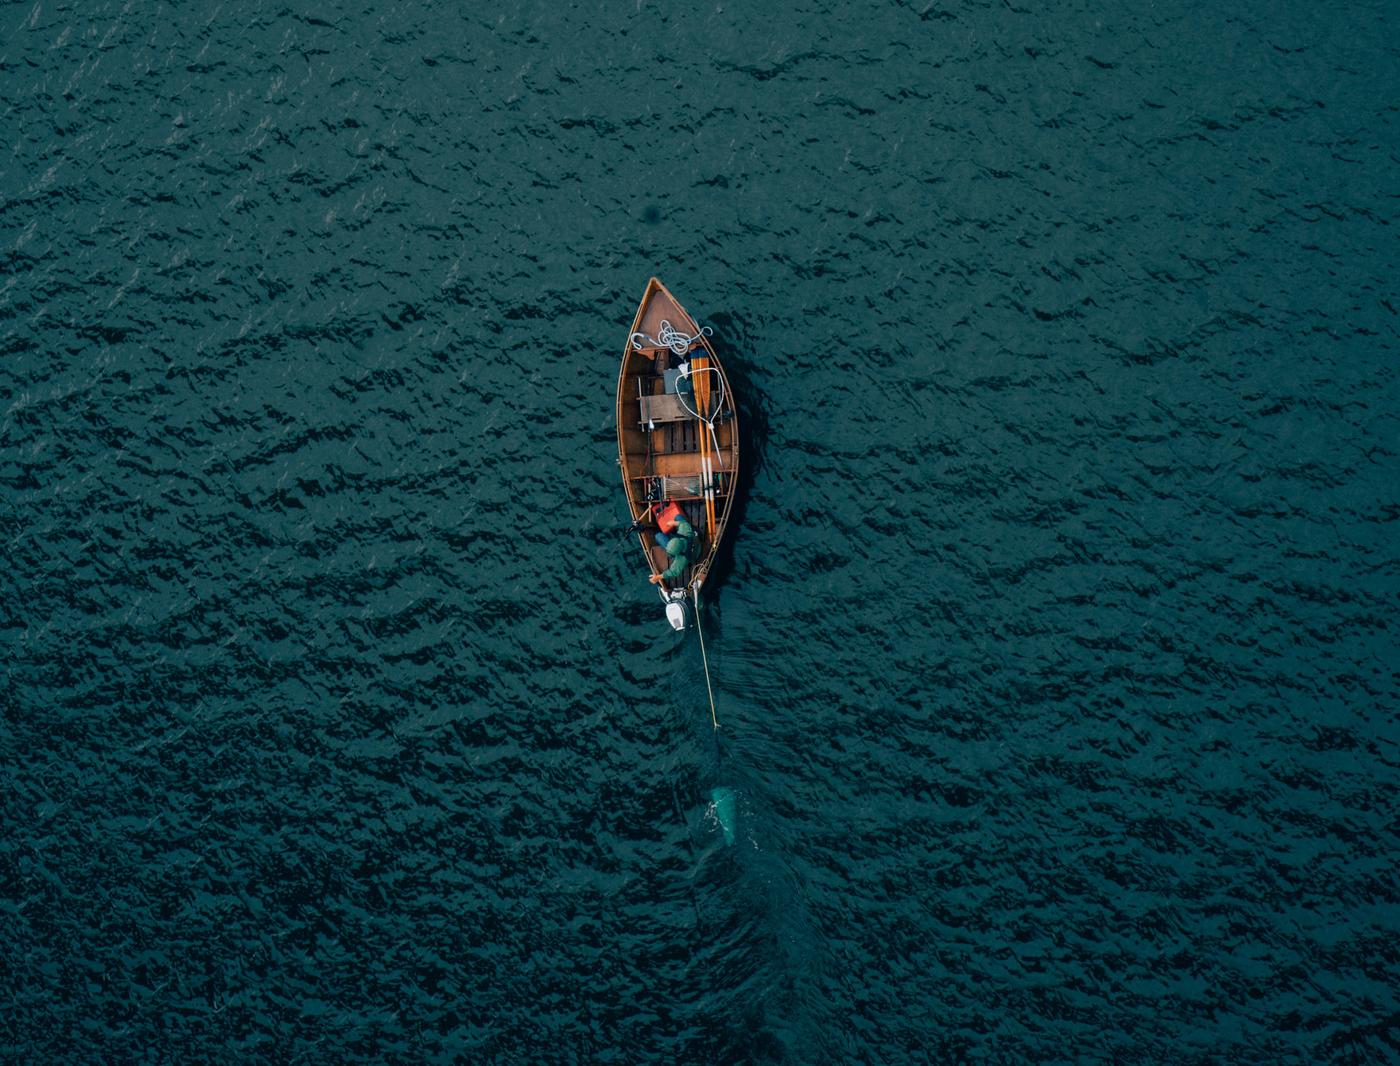 portland_boat.jpg